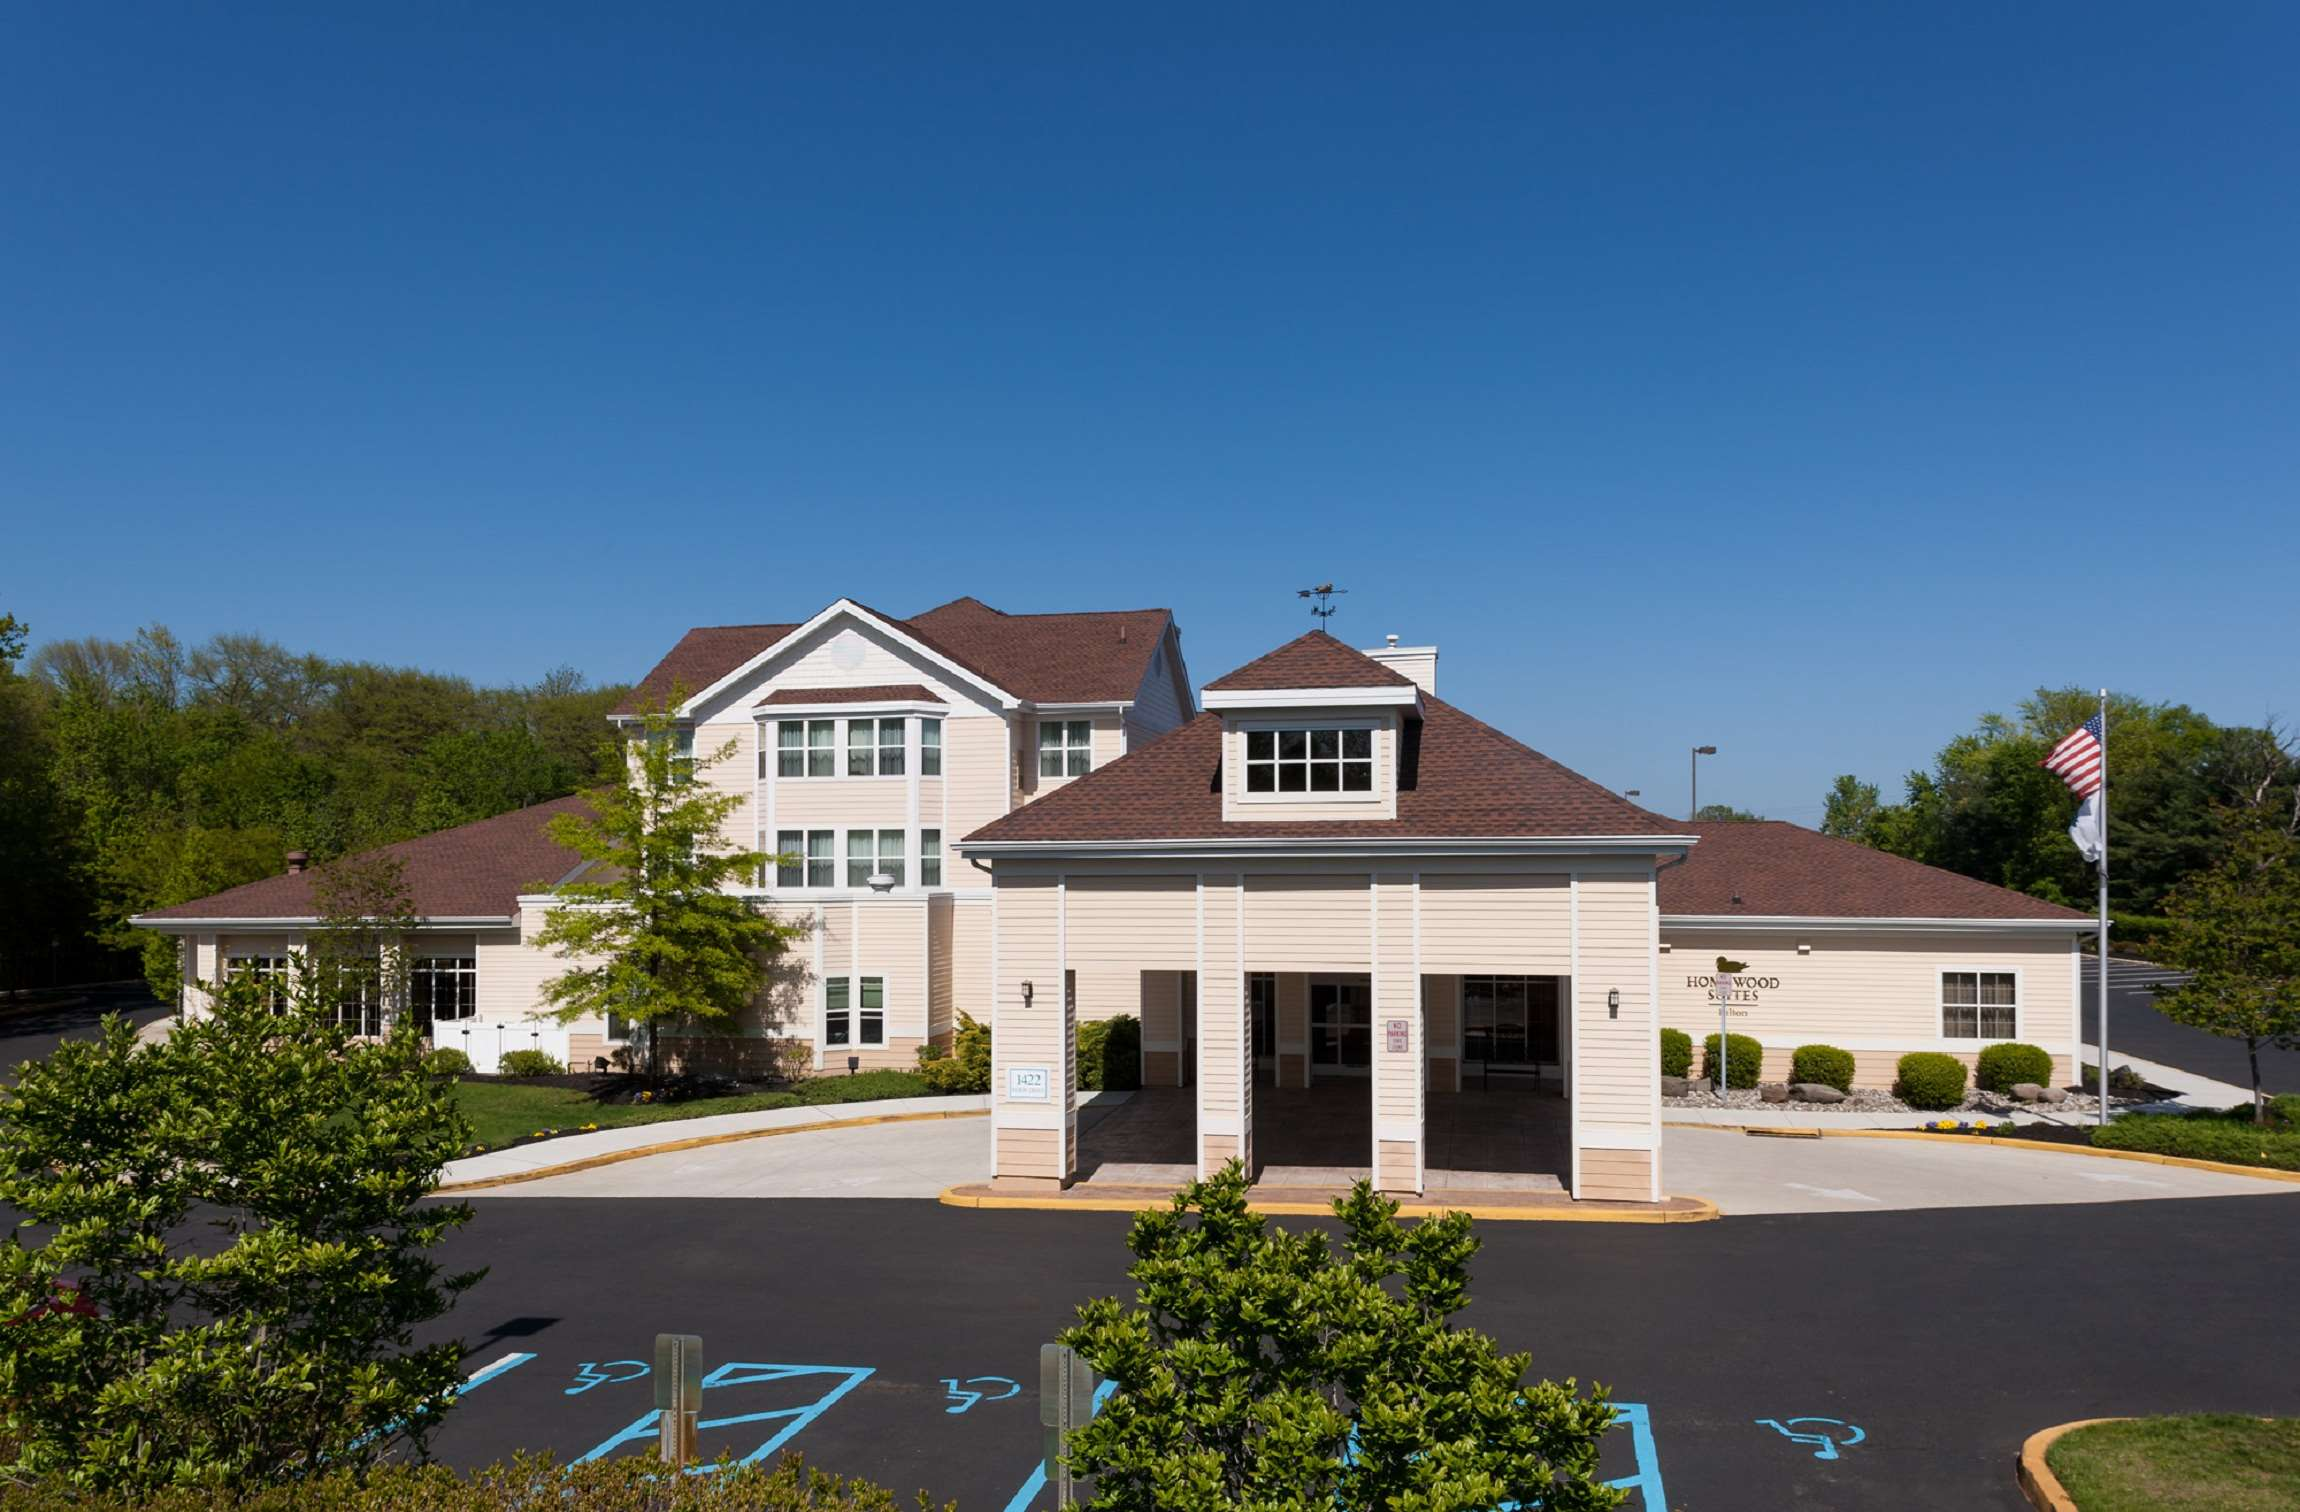 Homewood Suites by Hilton Philadelphia/Mt. Laurel image 2